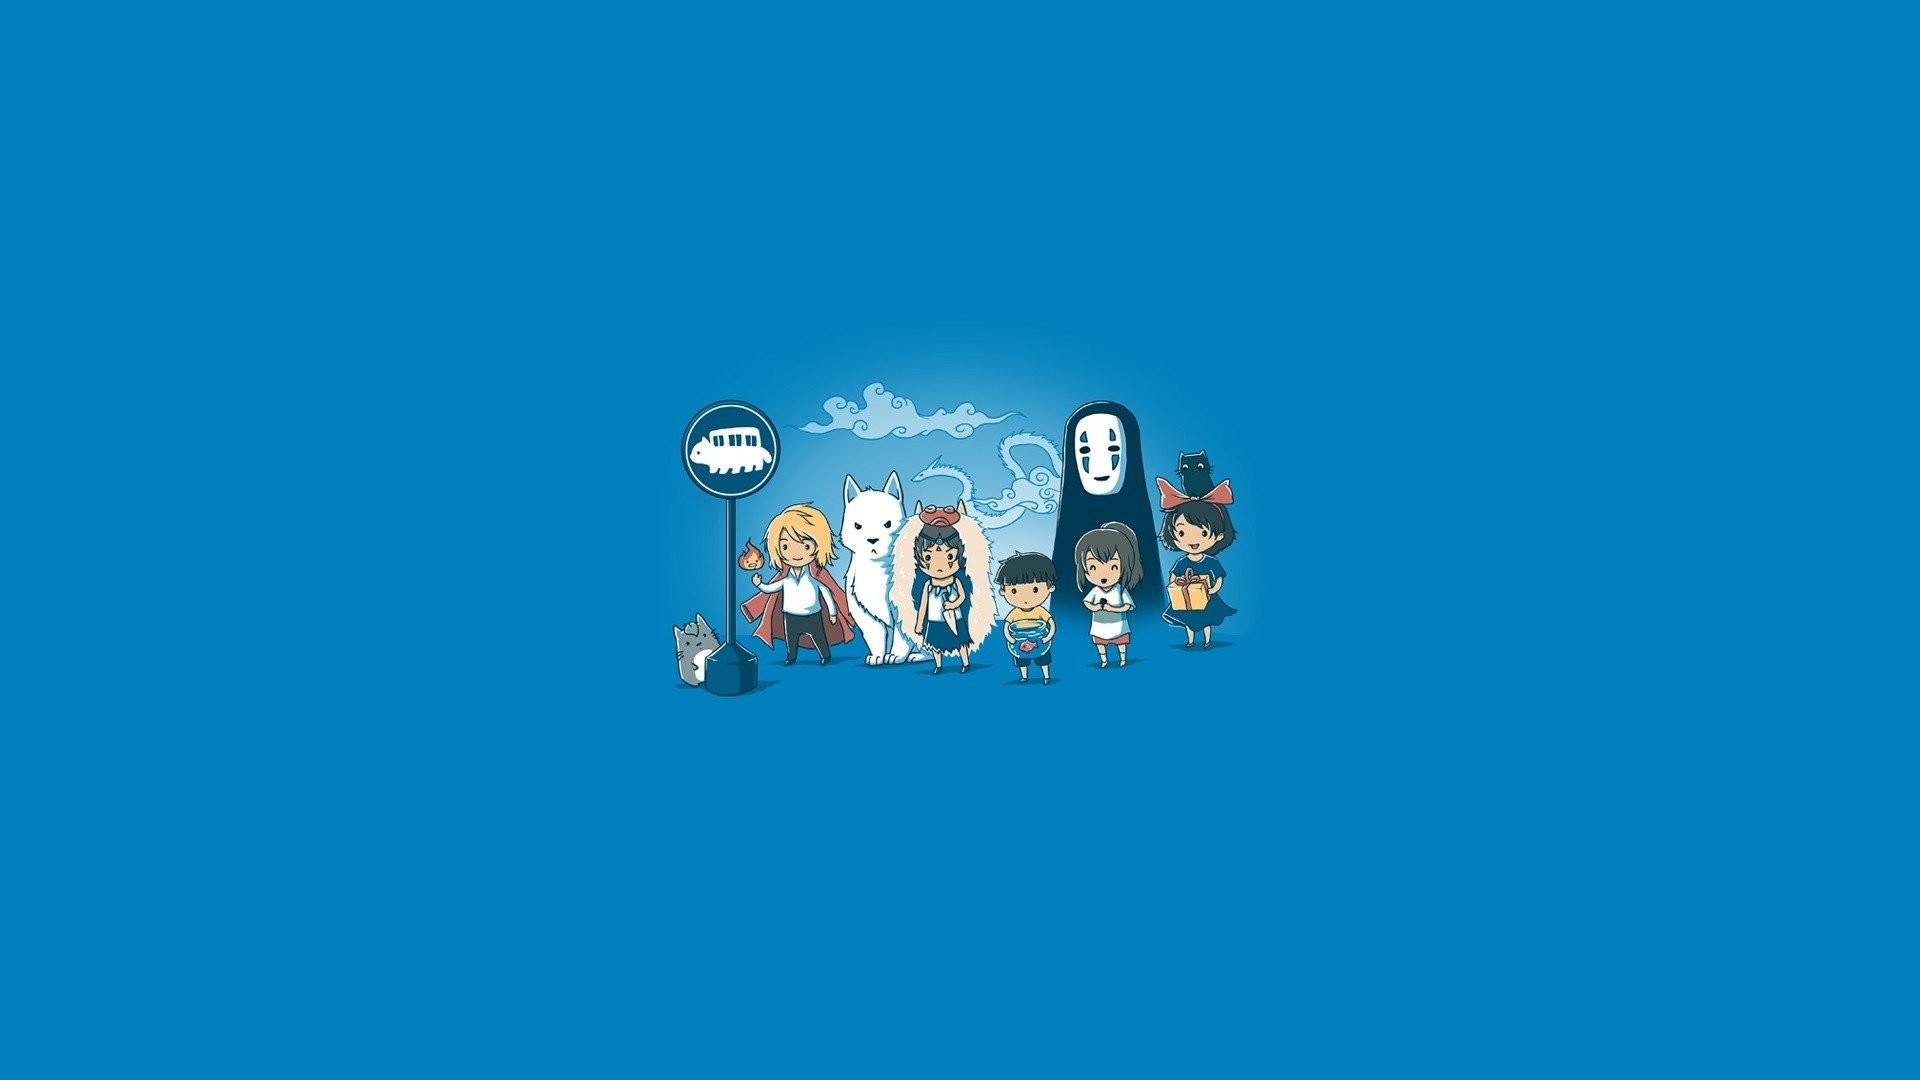 Studio Ghibli My Neighbor Totoro Howl's Moving Castle In The Sky Princess  Mononoke Simple Background Minimalism …